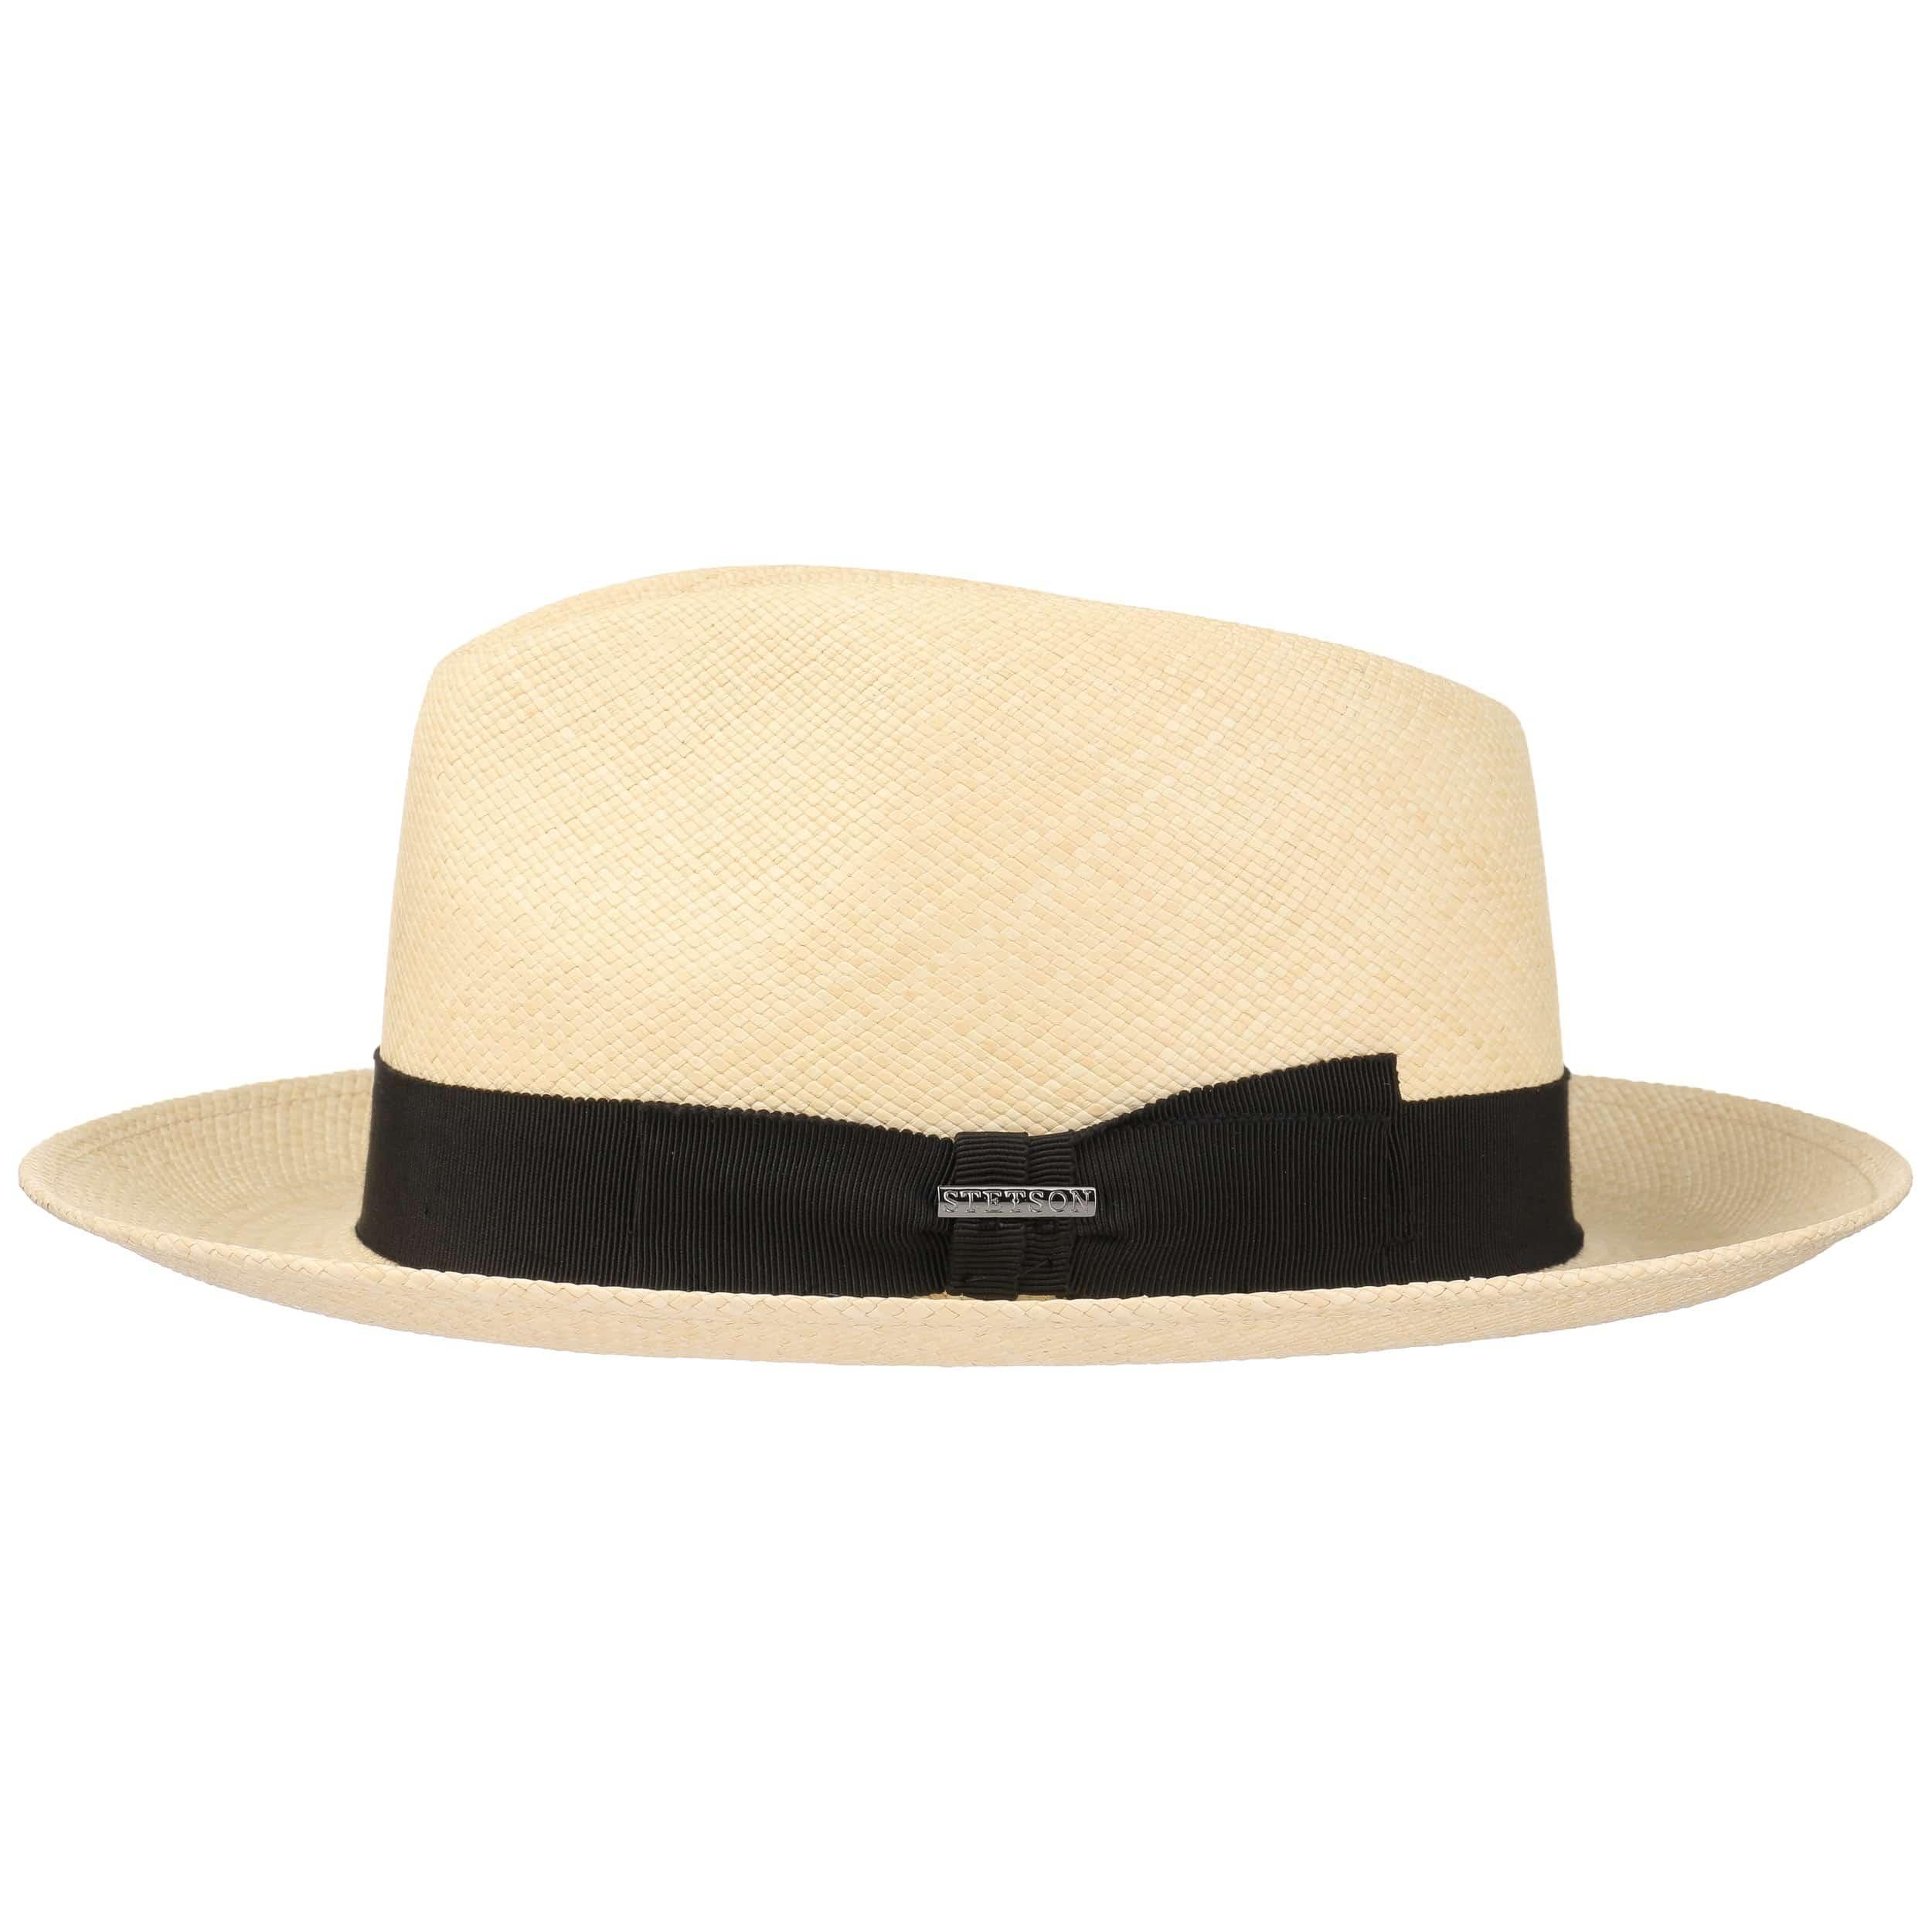 4abfb426984e Solano Fedora Panama Hat by Stetson, GBP 149,00 --> Hats, caps ...